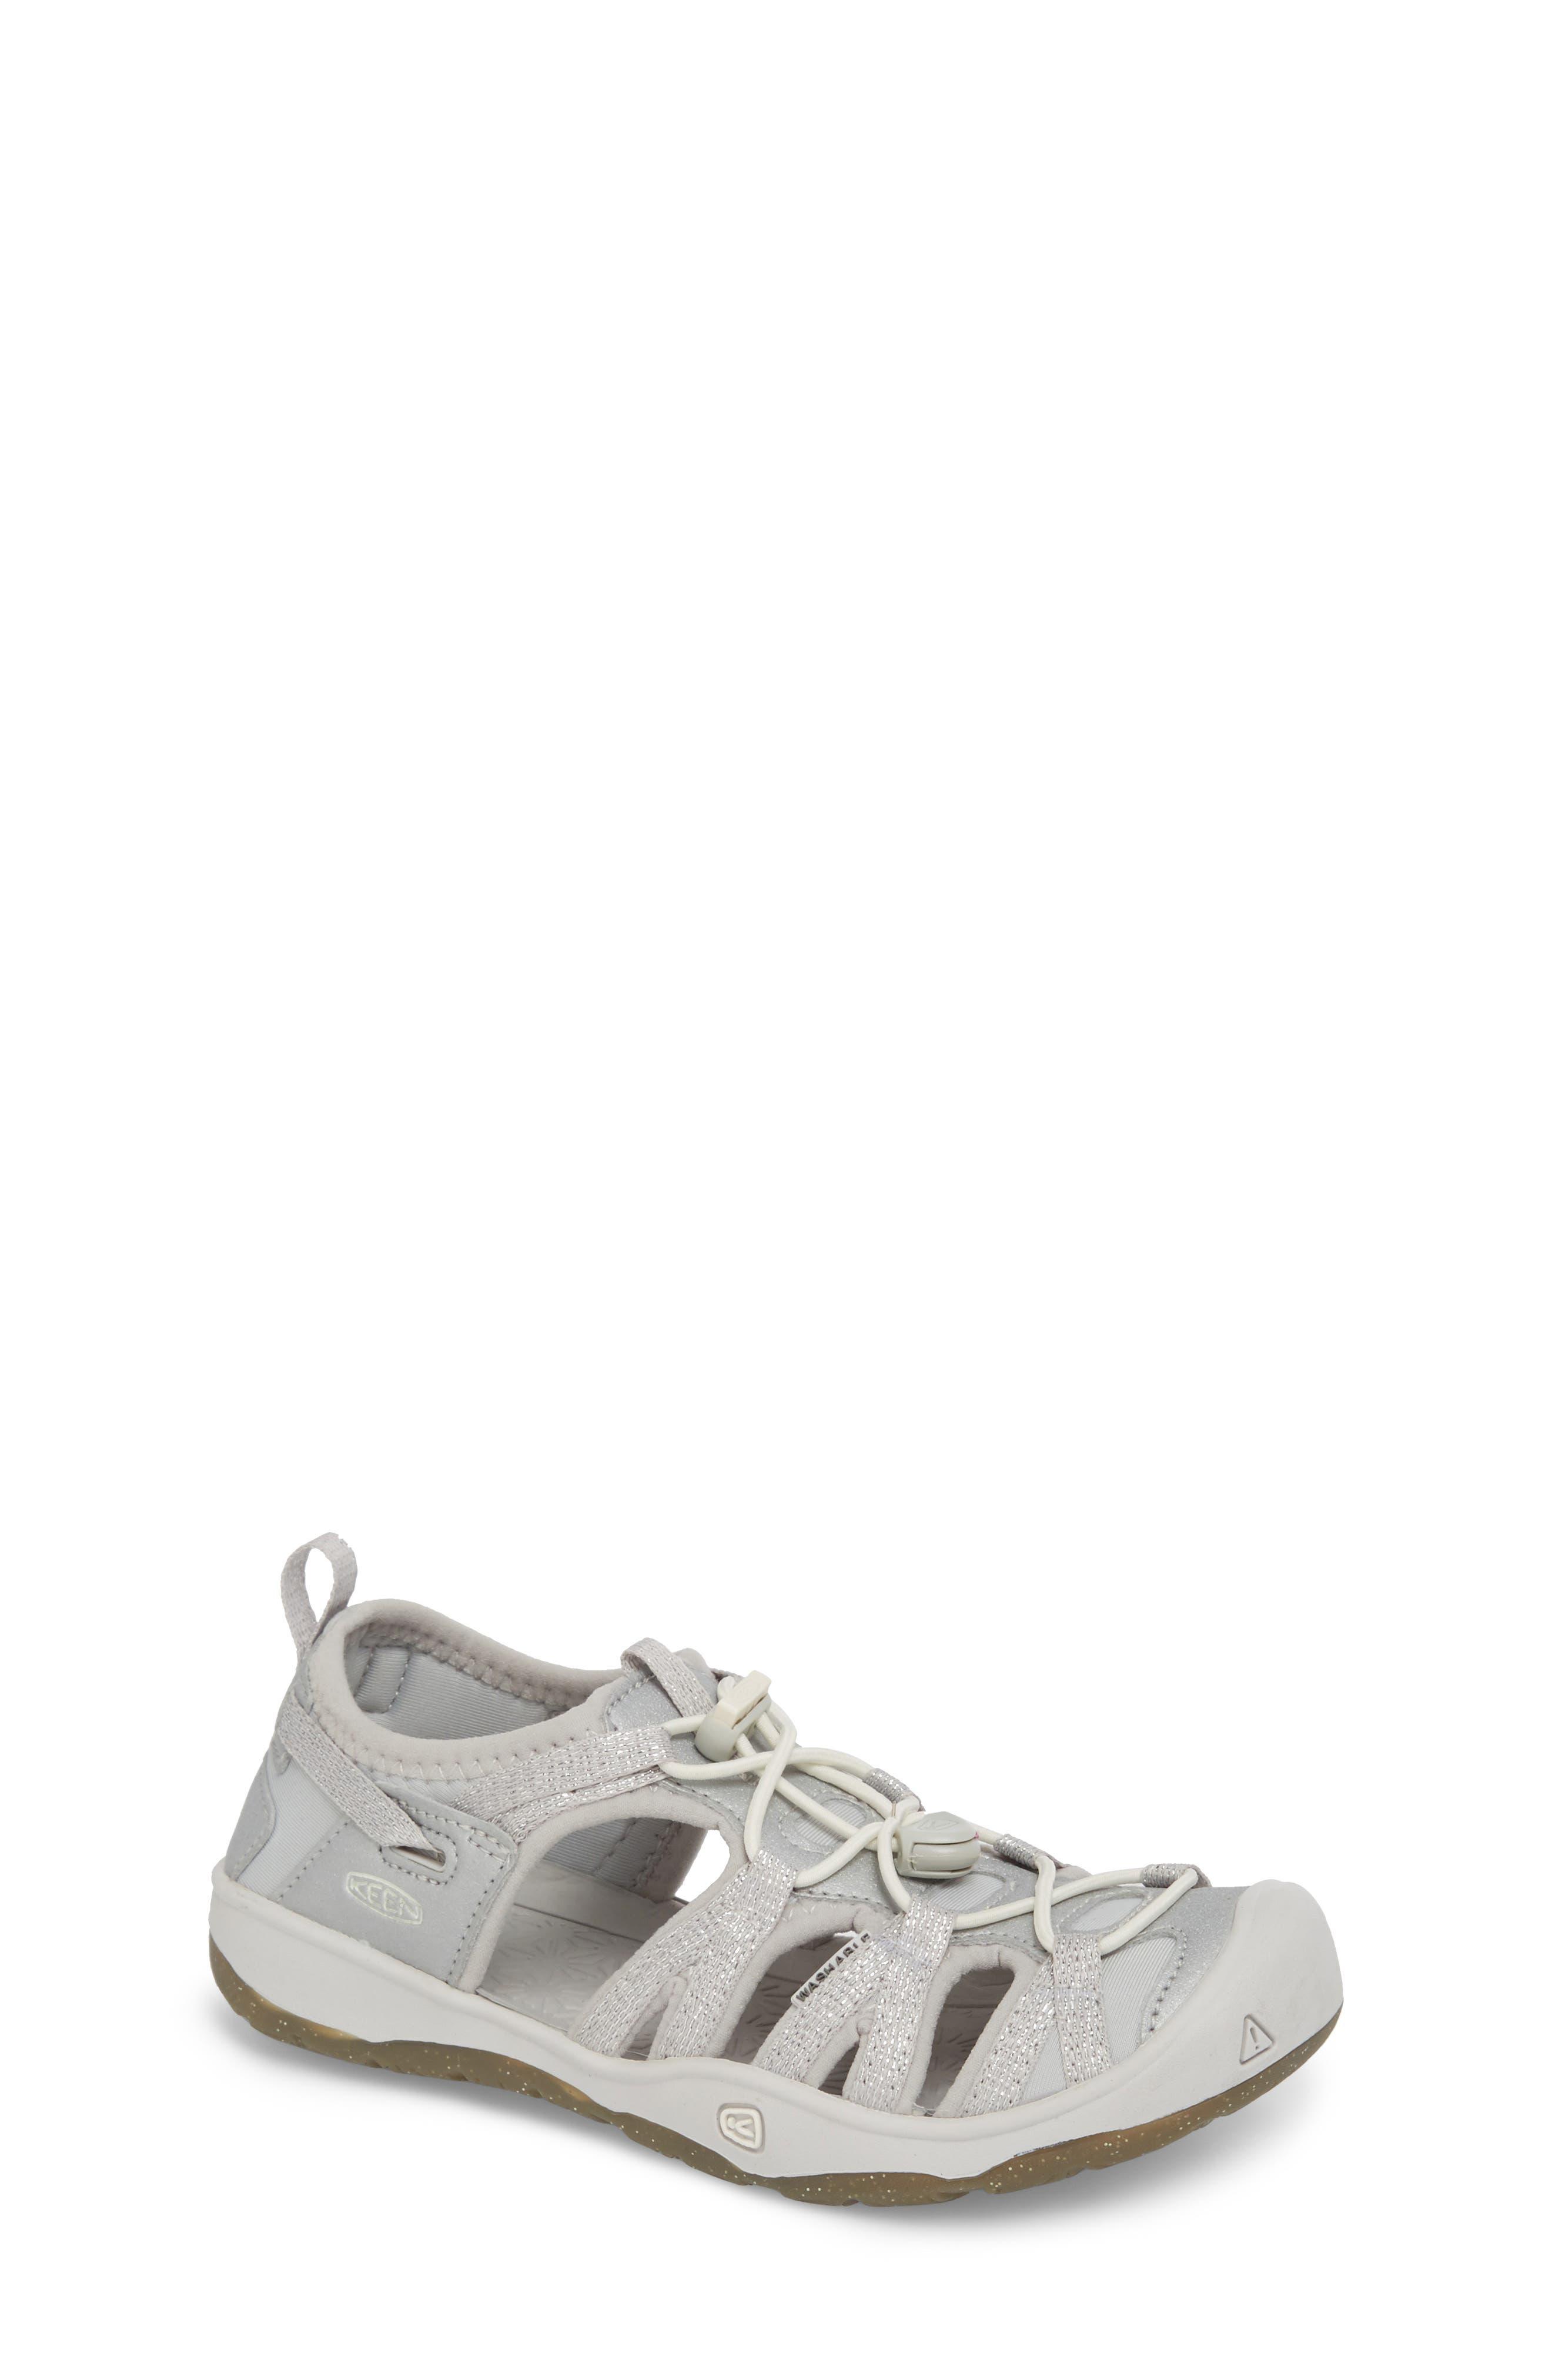 Boys Metallic Shoes